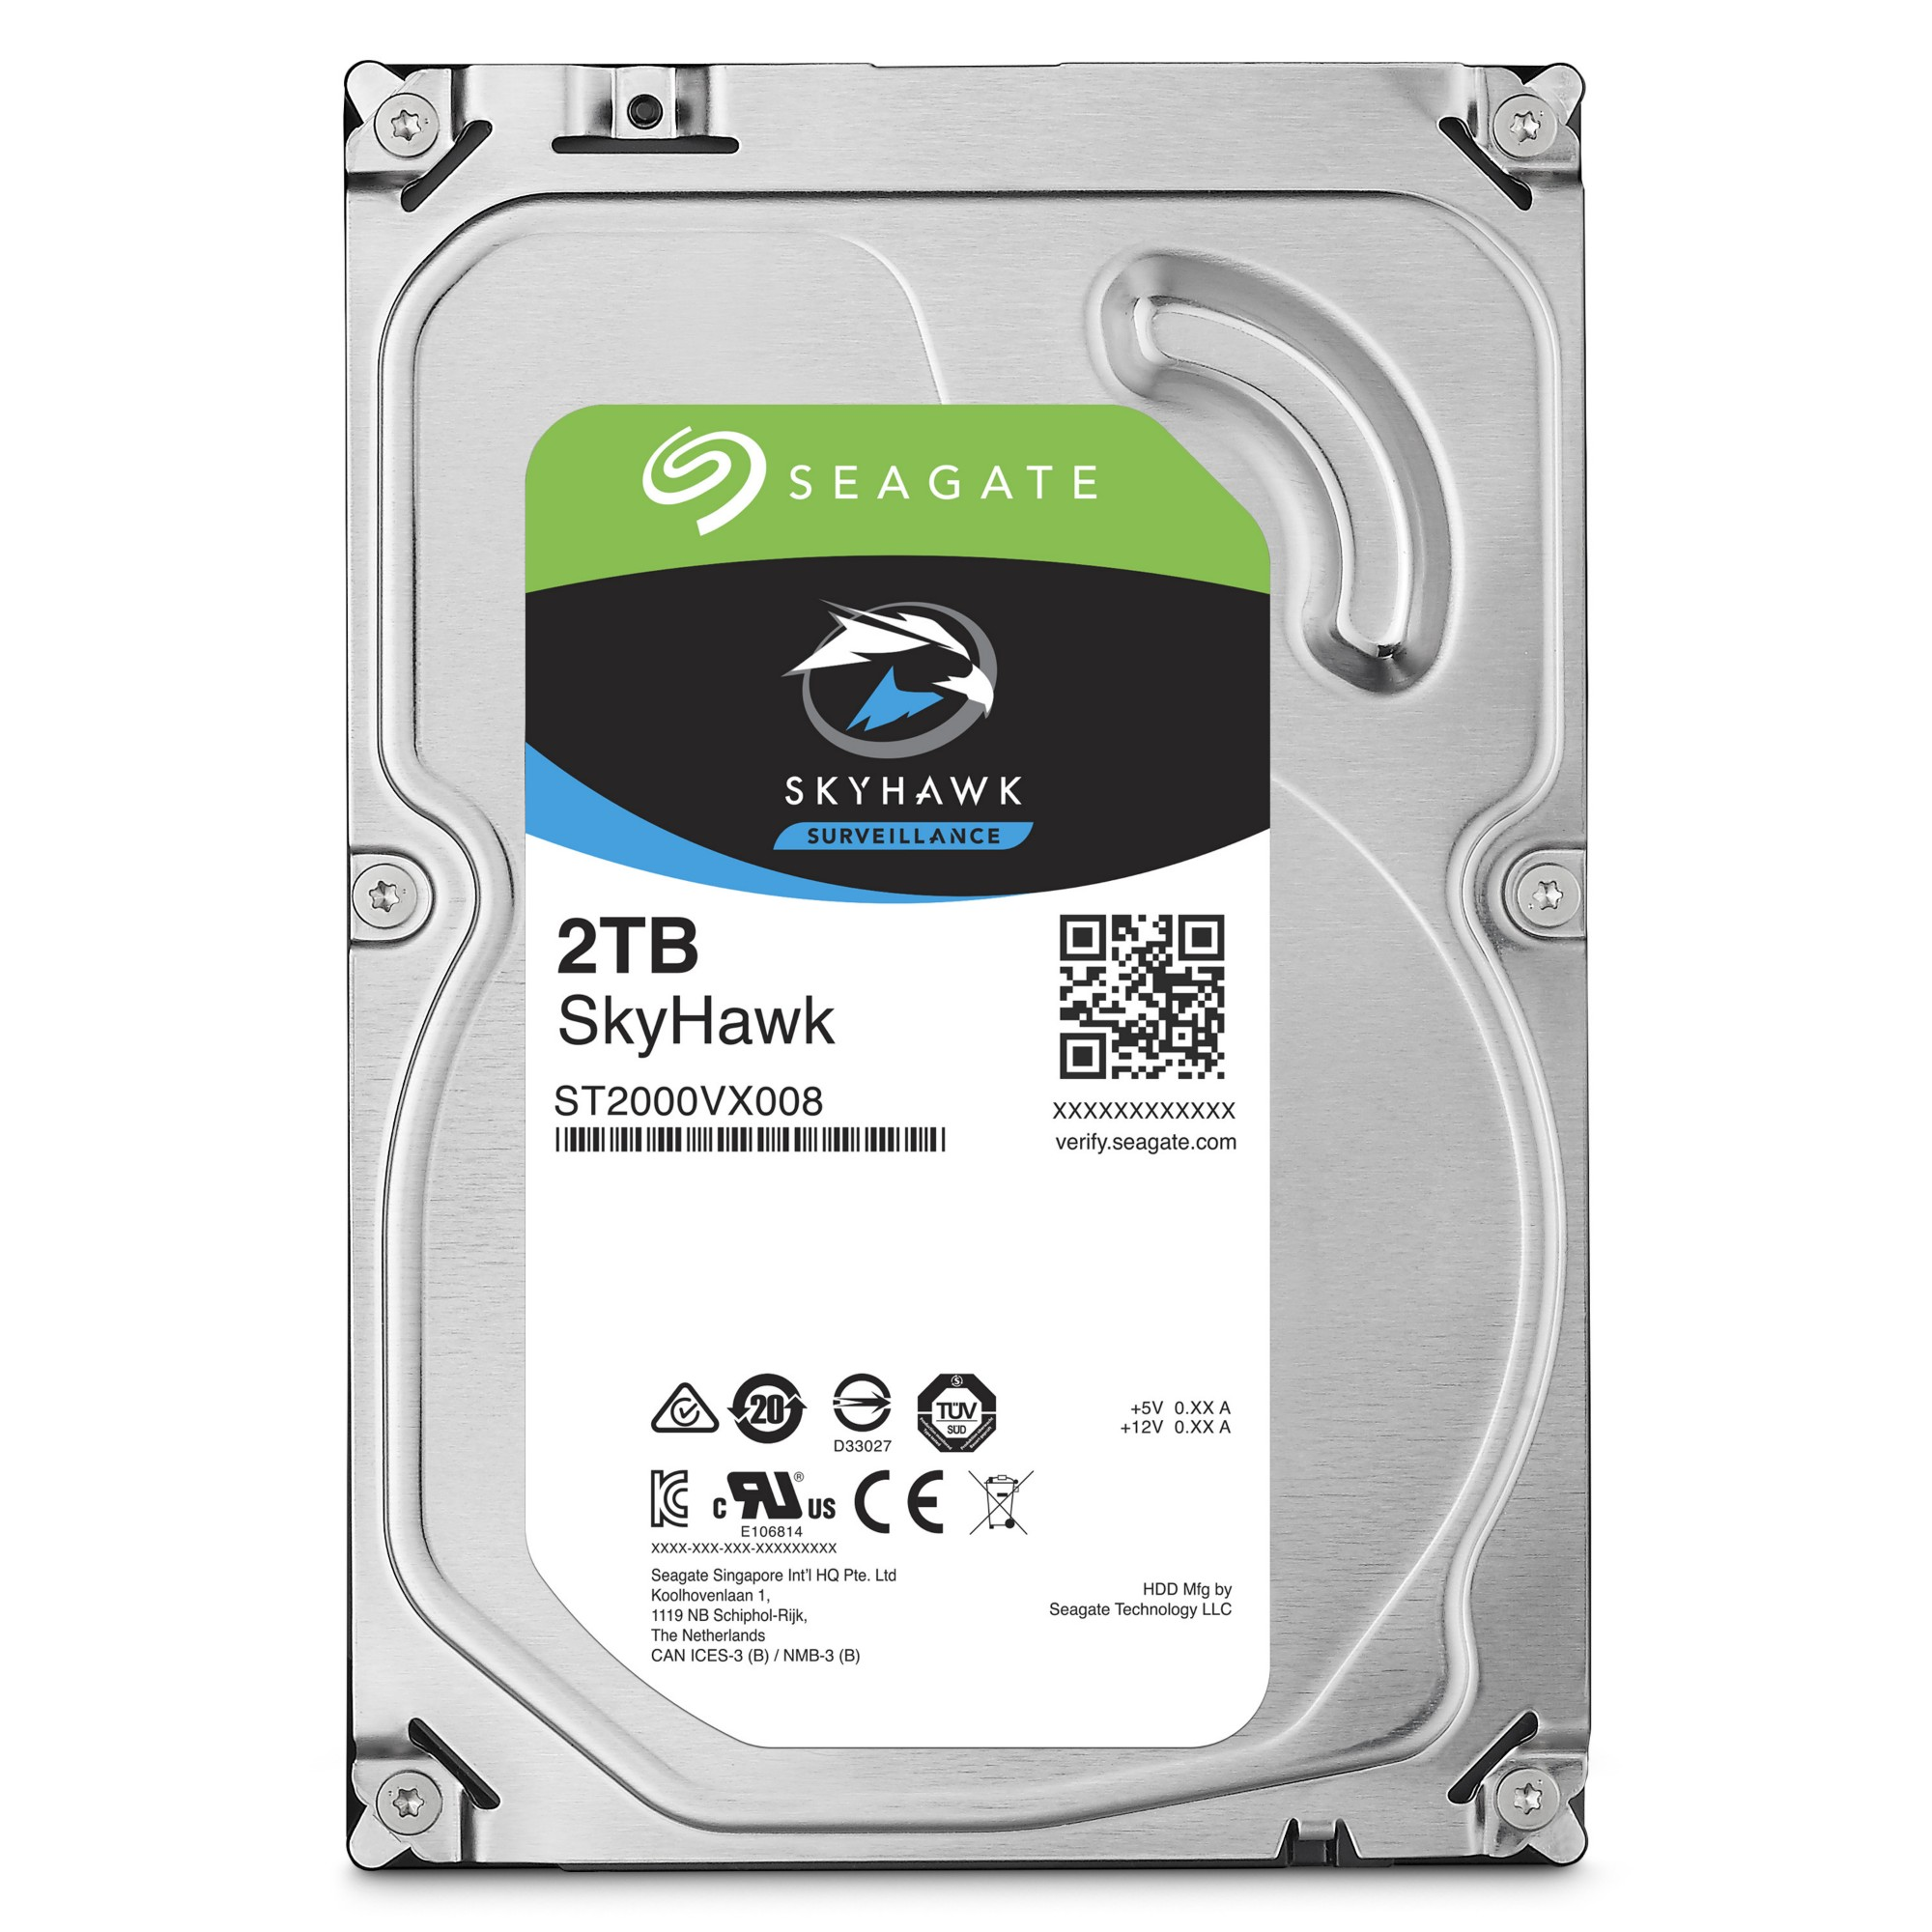 Seagate Surveillance HDD SkyHawk 2TB 2000GB Serial ATA III internal hard drive